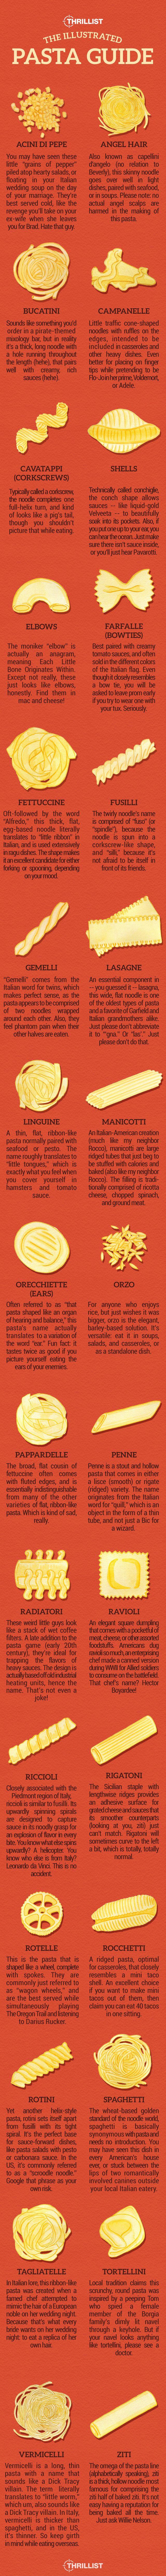 types of pasta, pasta types, italian, noodles, rotini, spaghetti,acini di pepe, manicotti,  linguini